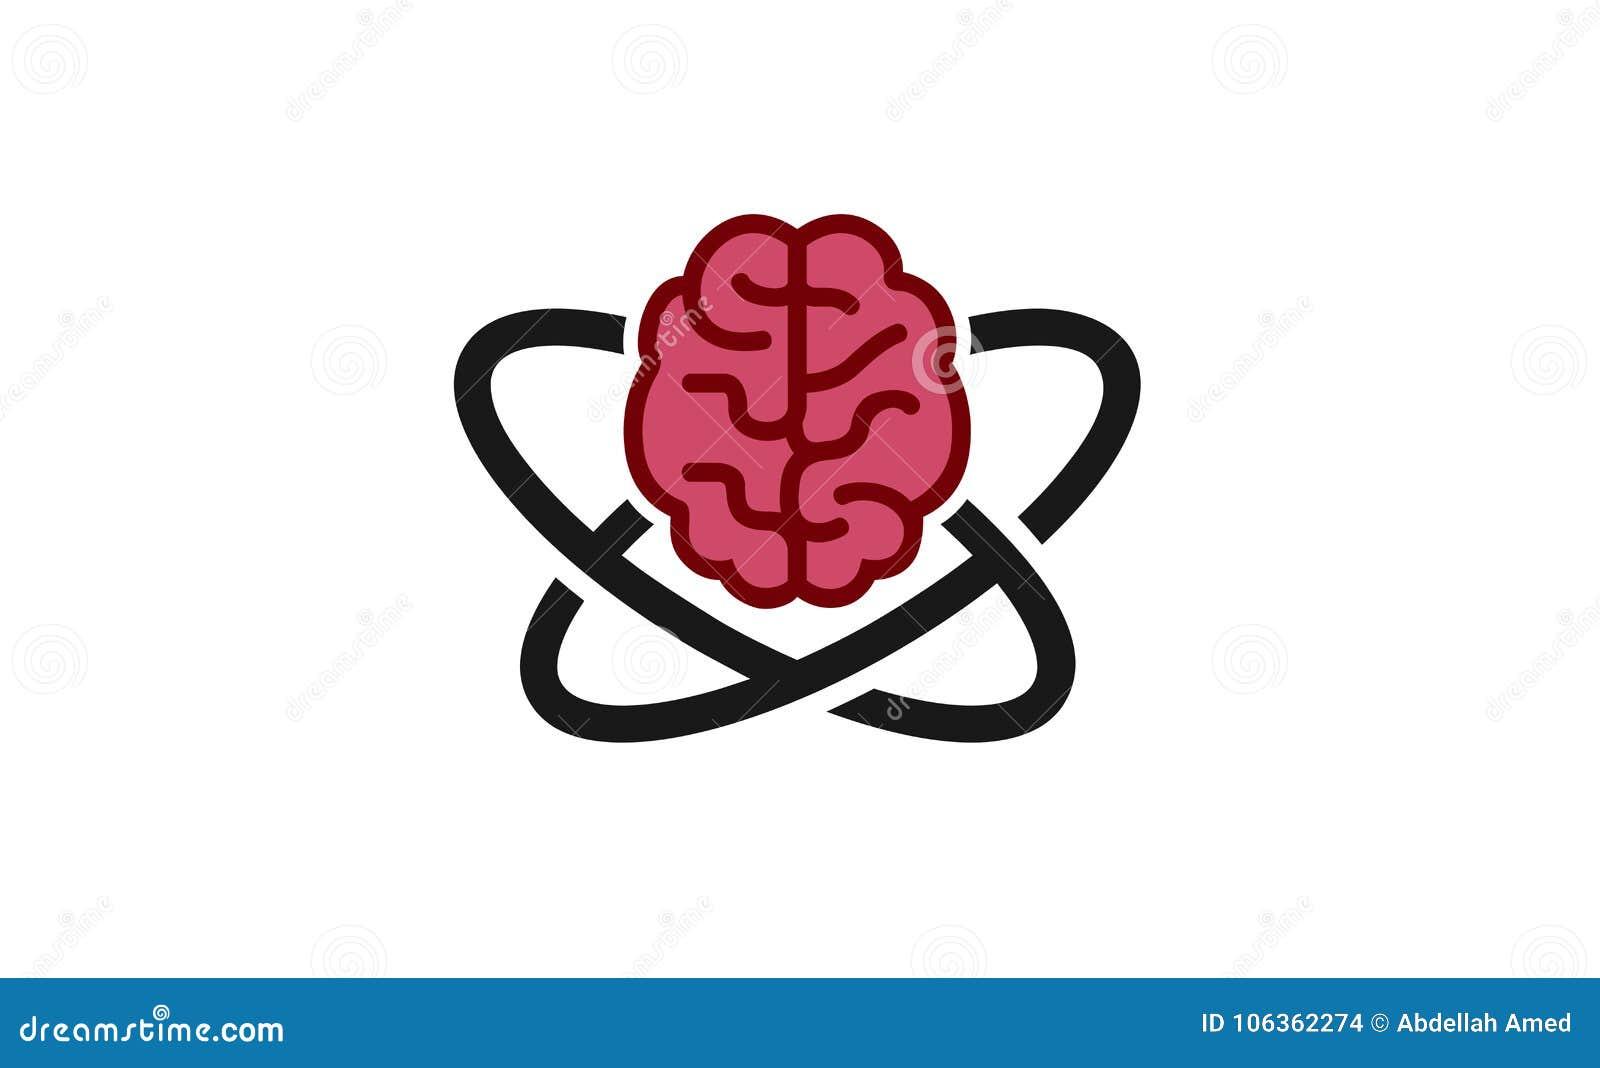 Atomic Brain Logo Design Illustration Stock Vector Illustration Of